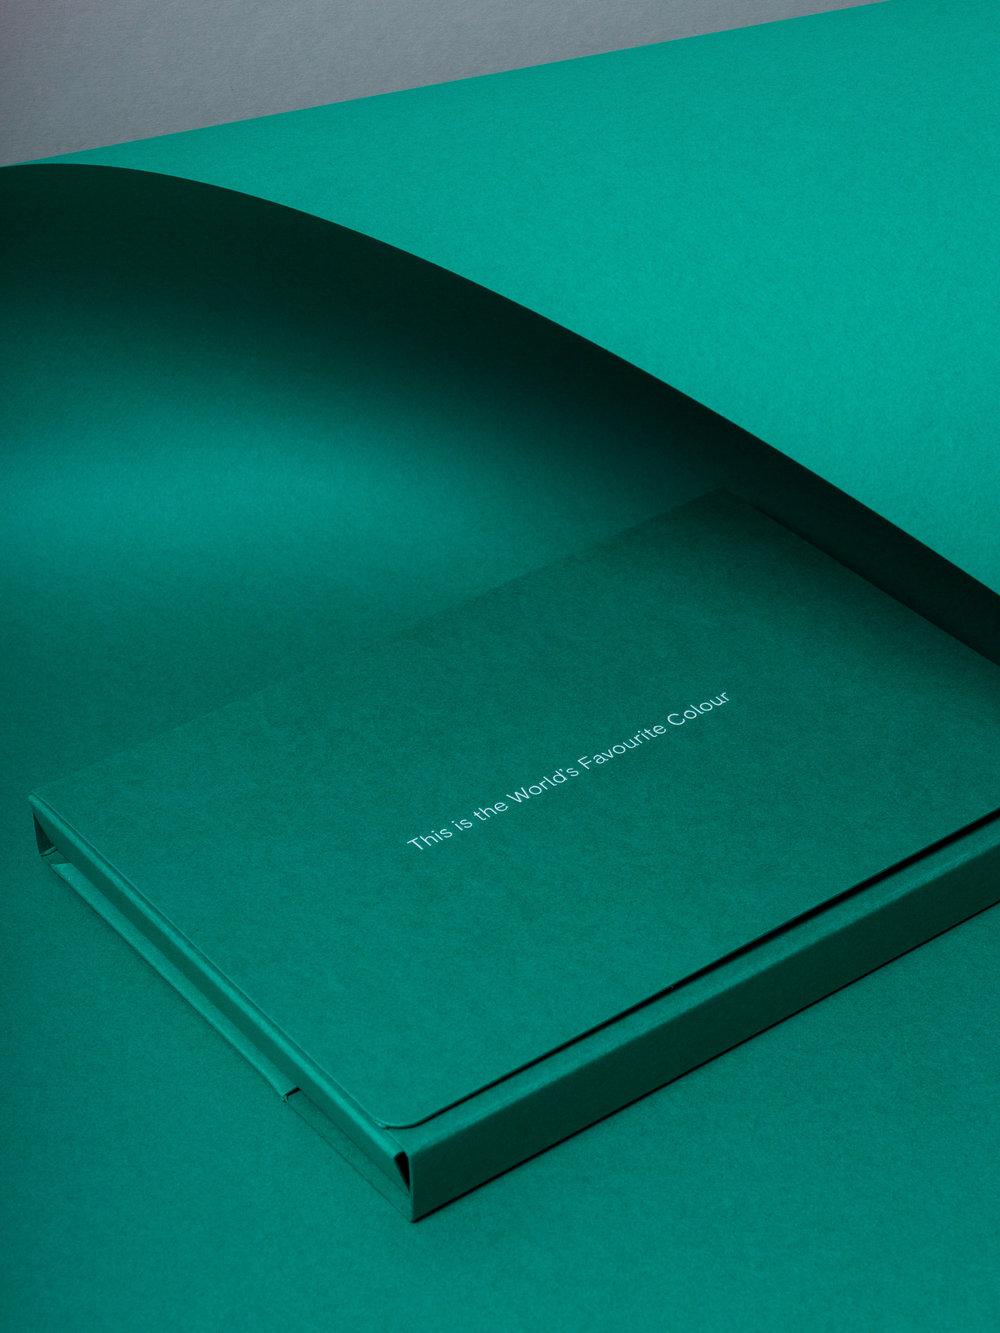 GF Smith - Colorplan - Studio - LR-53.jpg